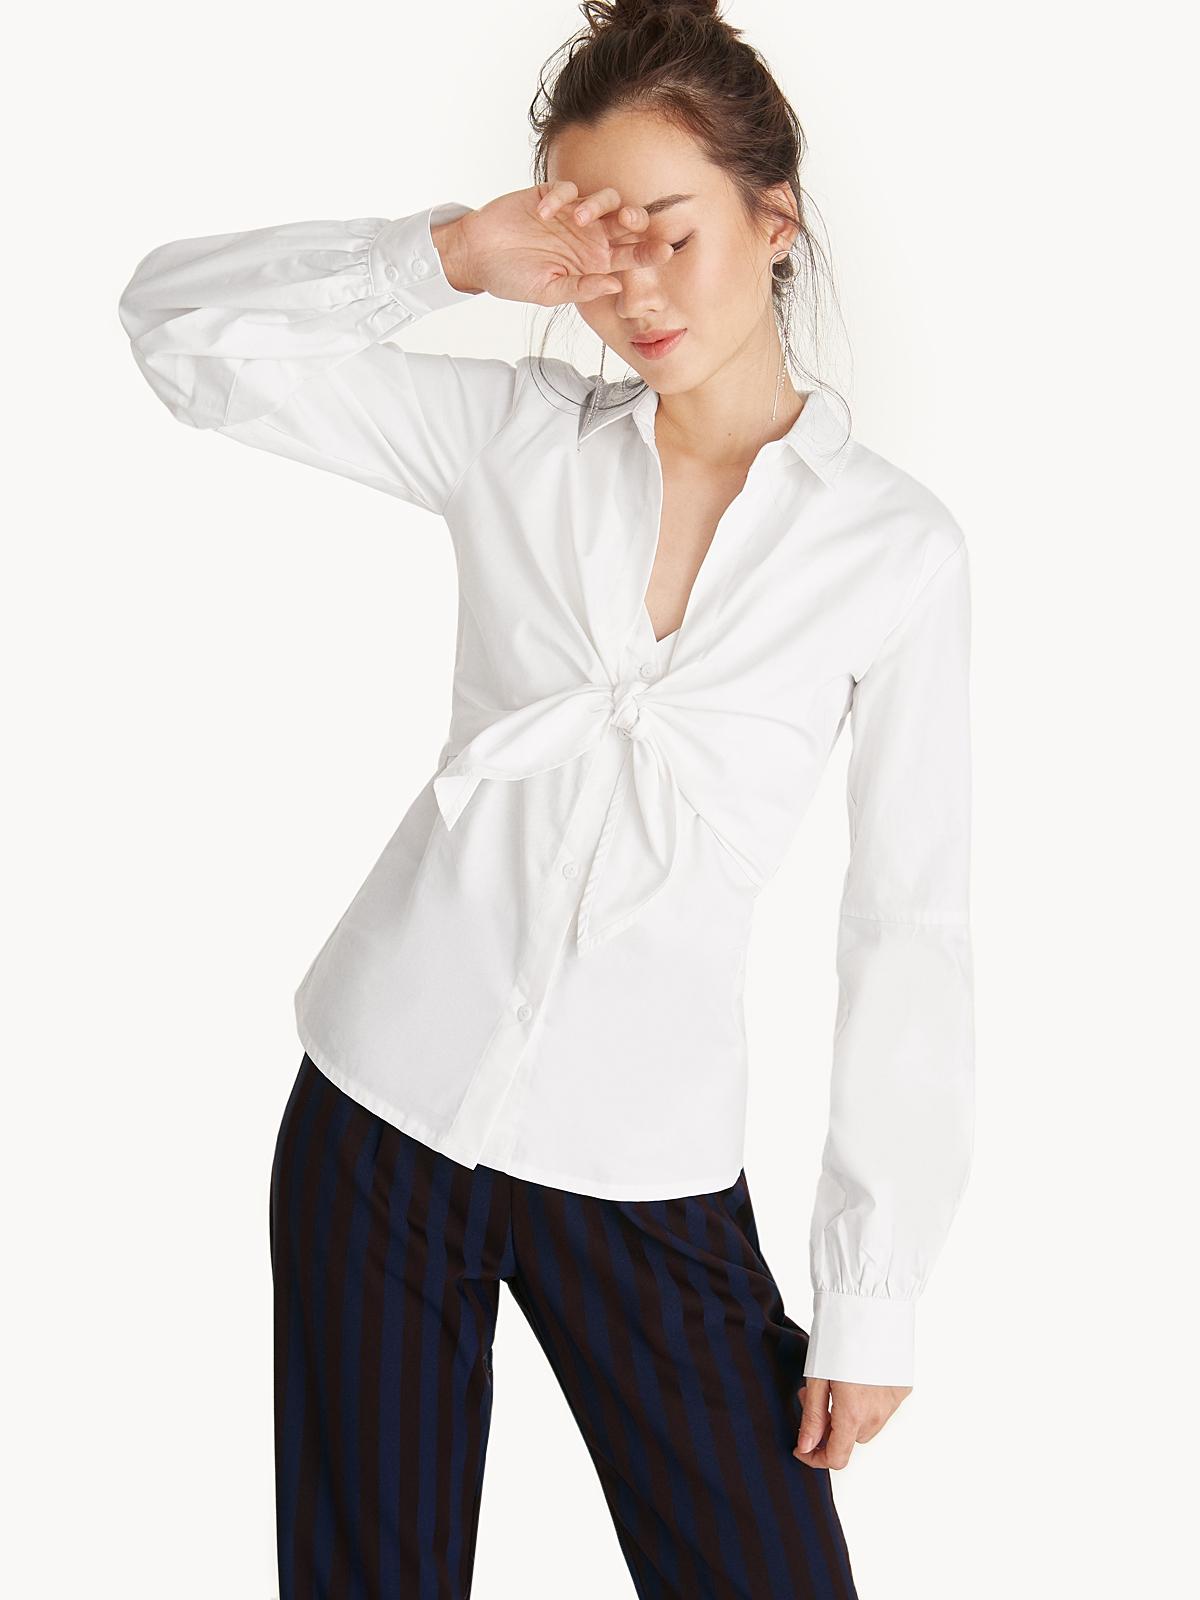 7e3e93af0 Front Knot Balloon Sleeve Button Down Shirt - Pomelo